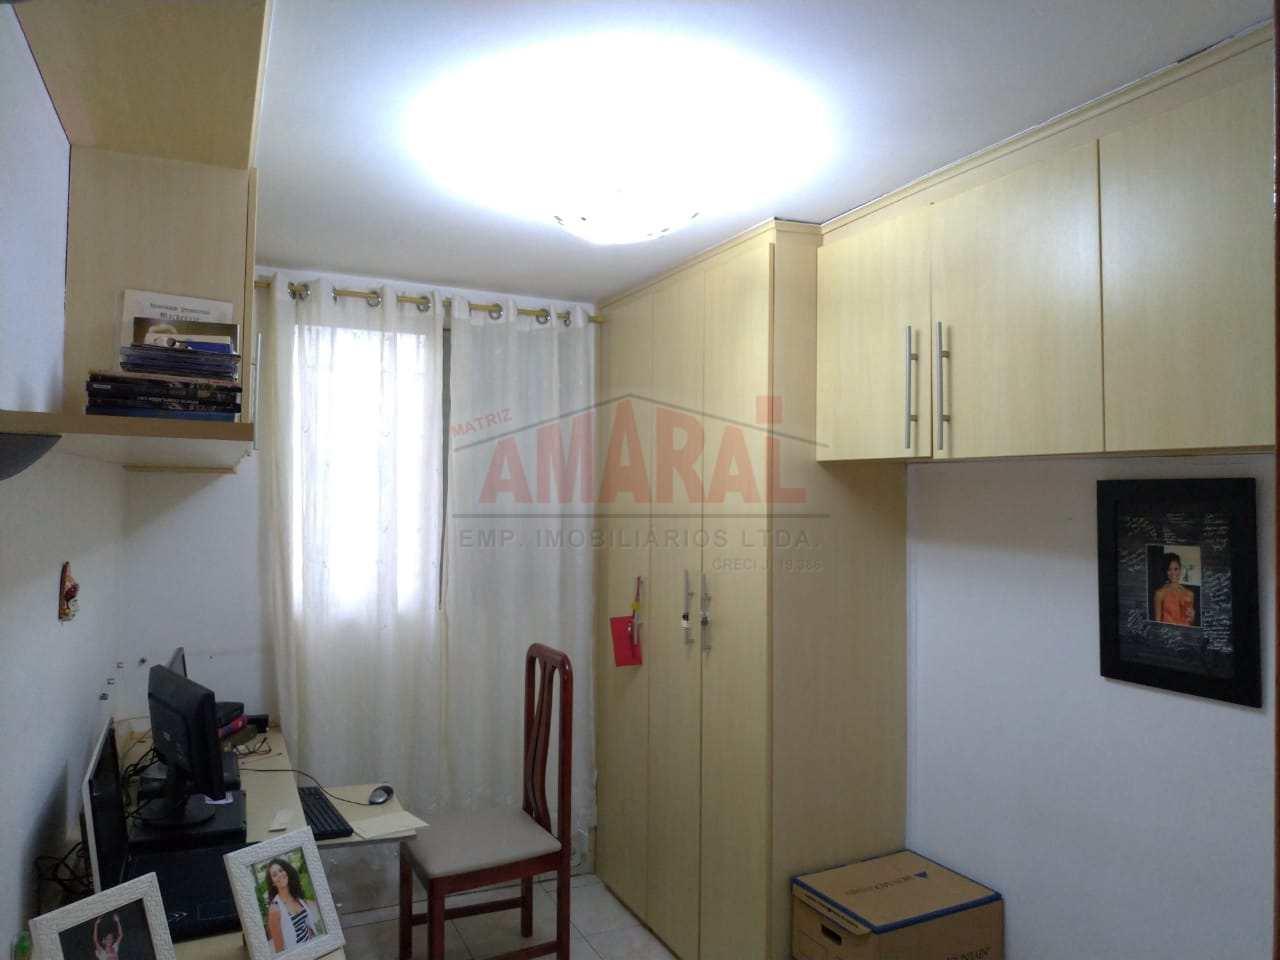 Apartamento com 2 dorms, Cidade Satélite Santa Bárbara, São Paulo - R$ 190 mil, Cod: 11294